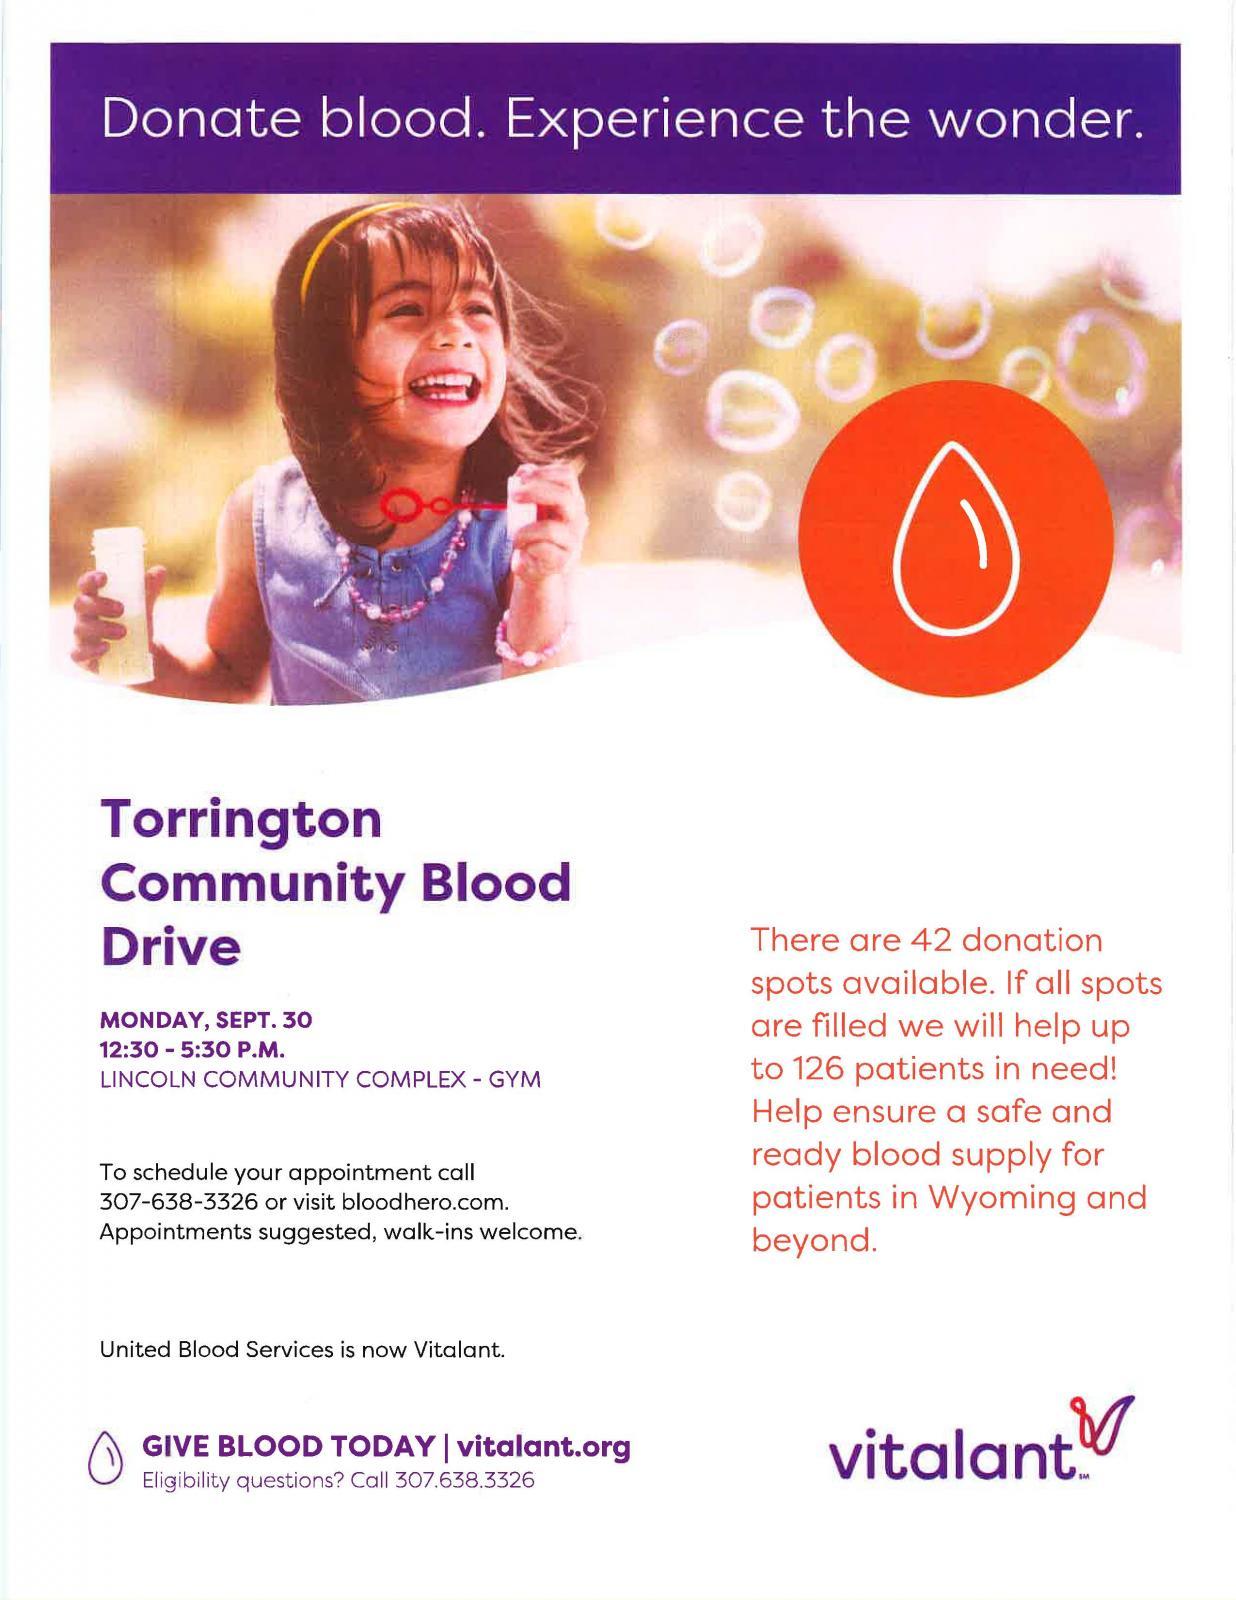 Torrington Community Blood Drive Photo